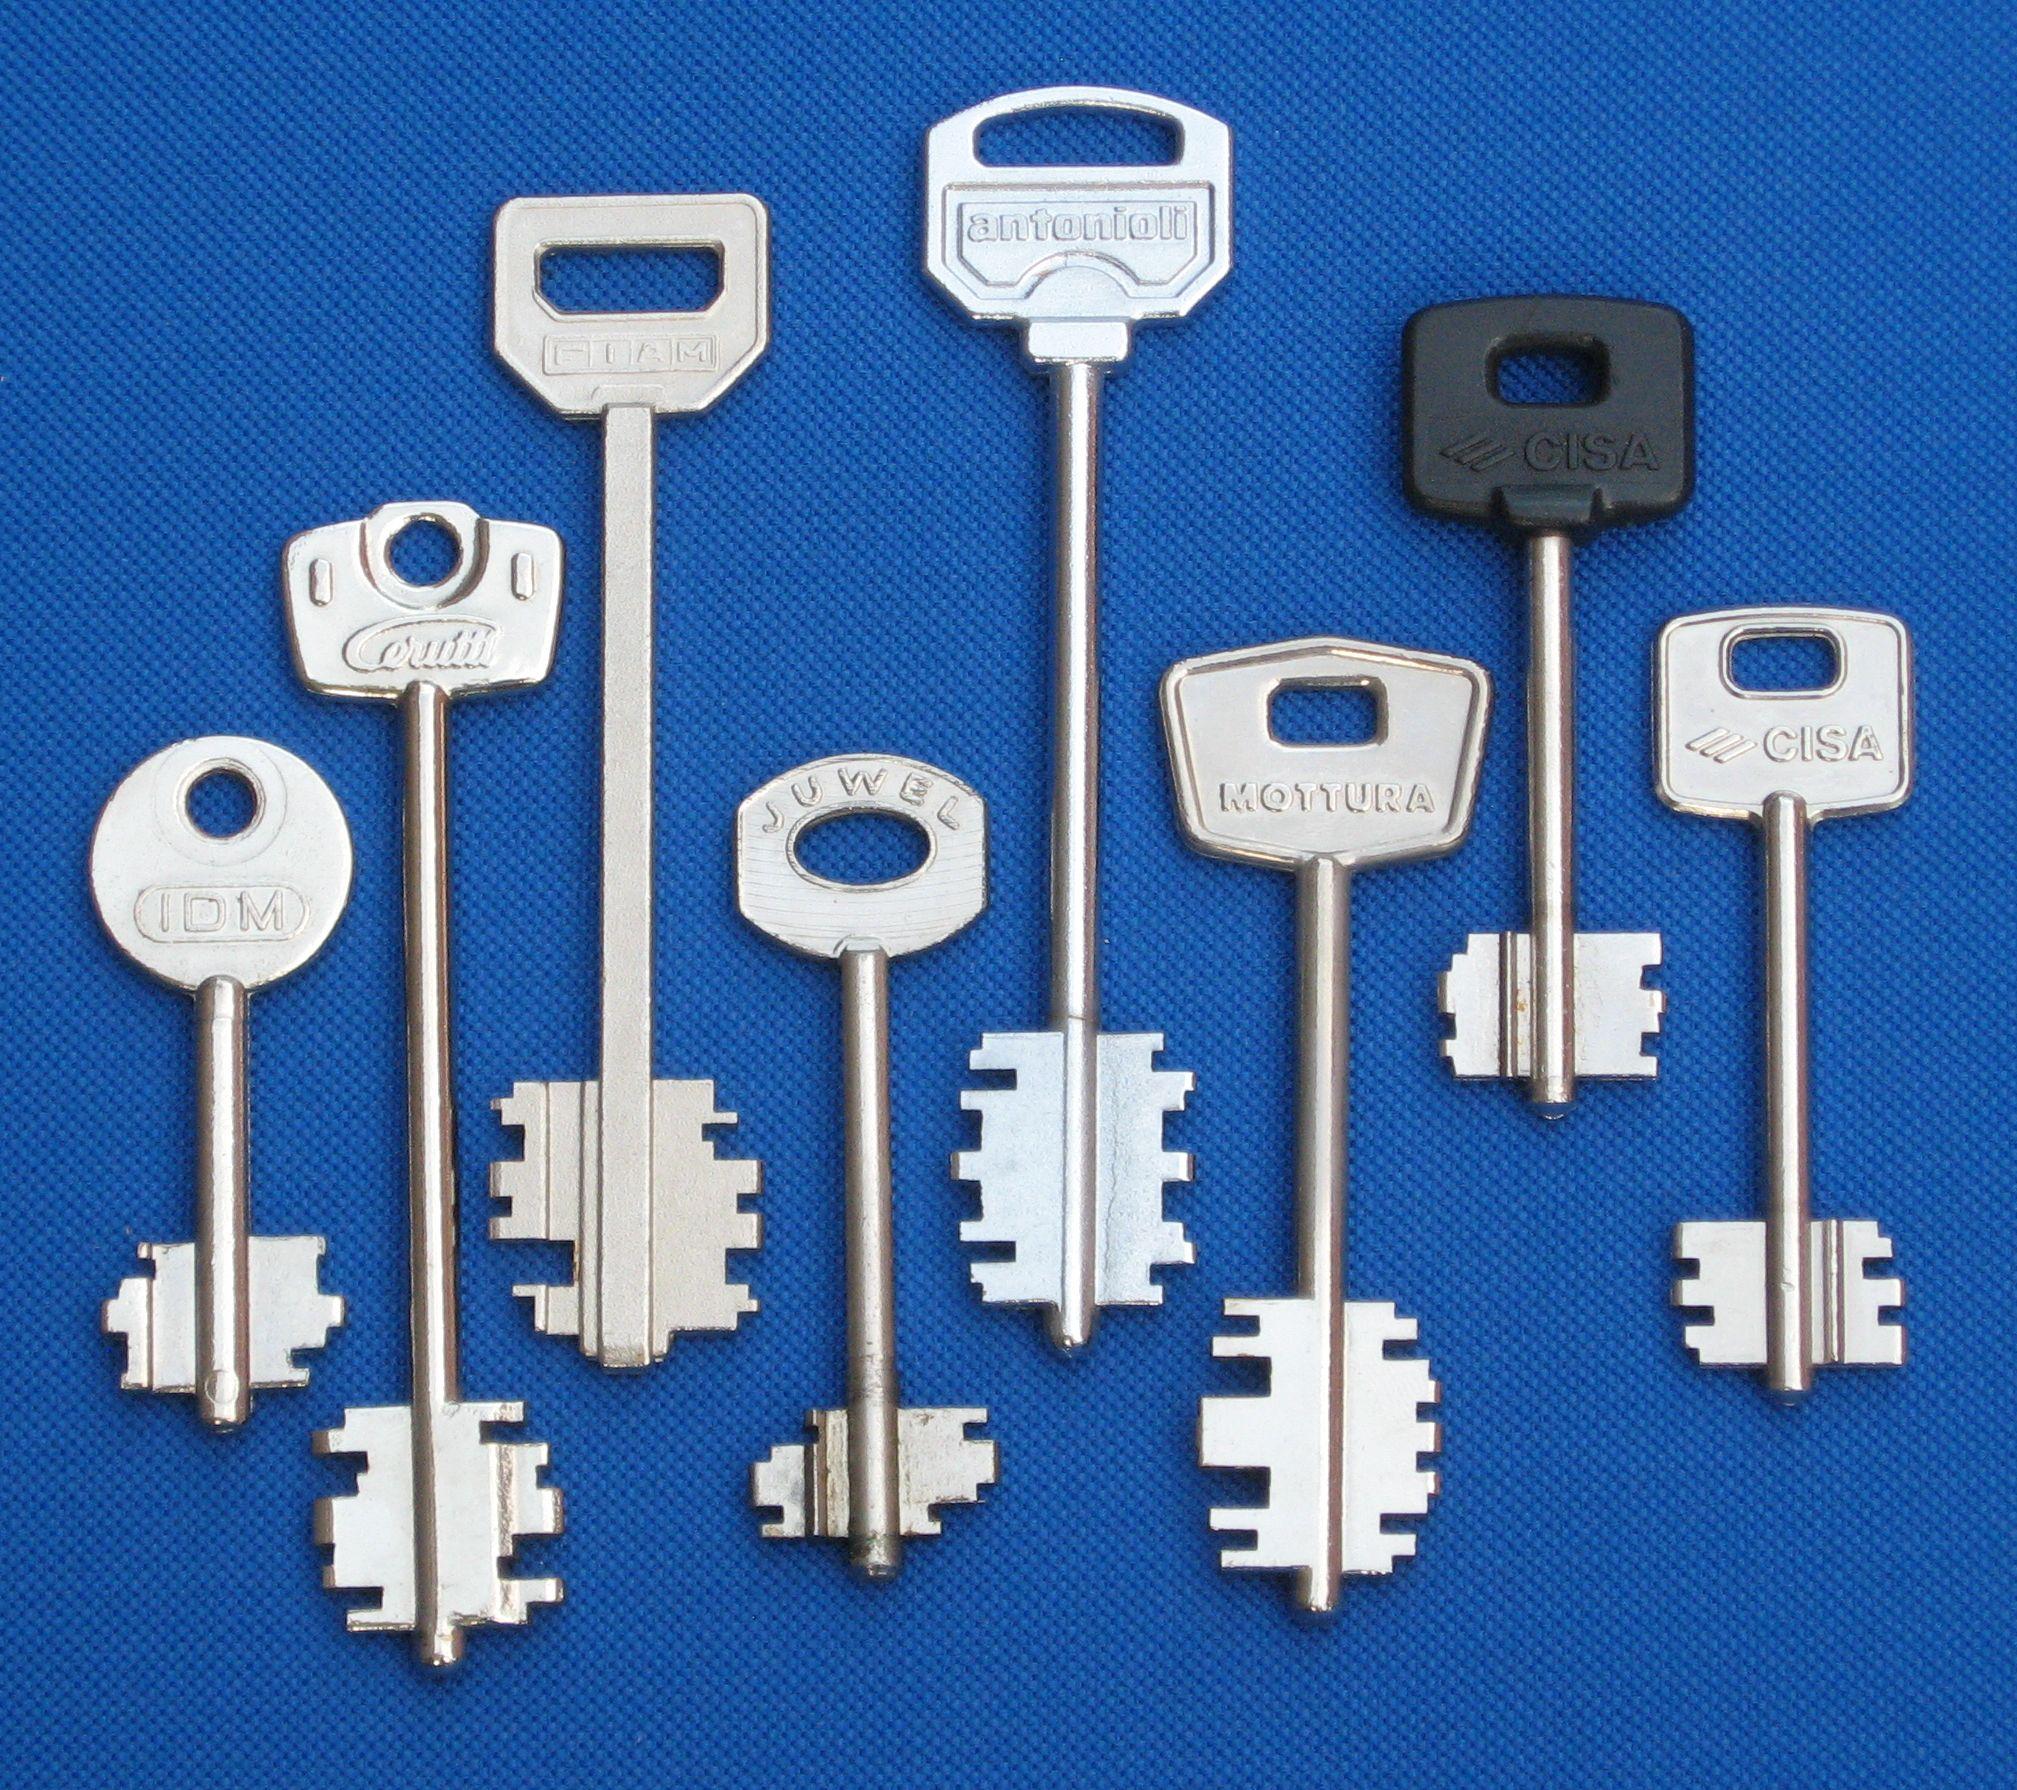 Duplicazione chiavi mestre venezia spinea chirignago for Serrature per porte blindate